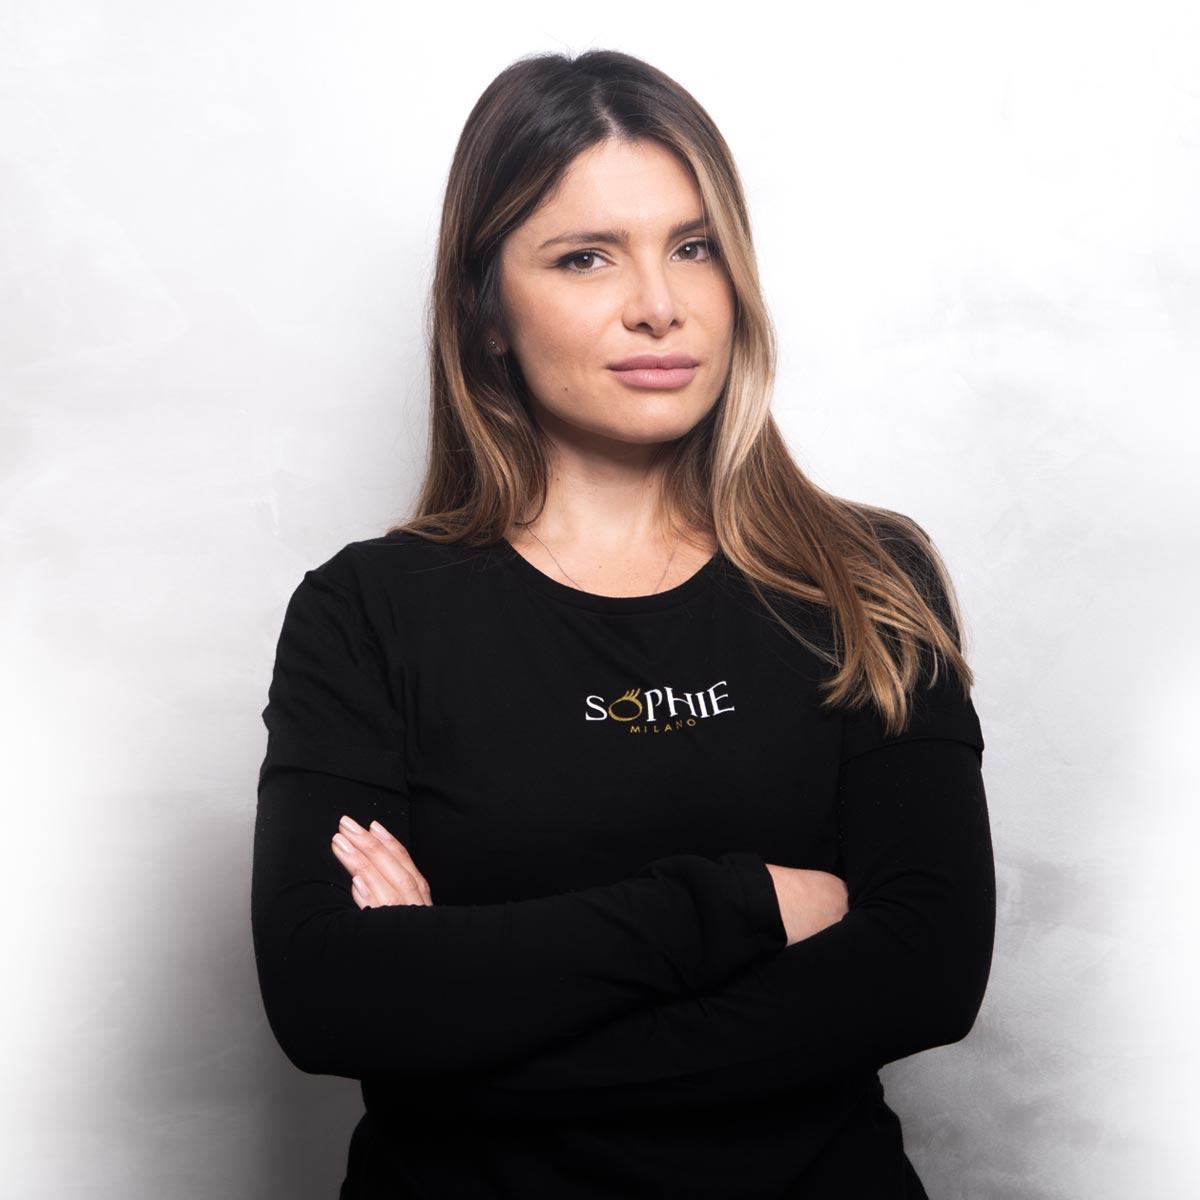 Emanuela Romana Longarini